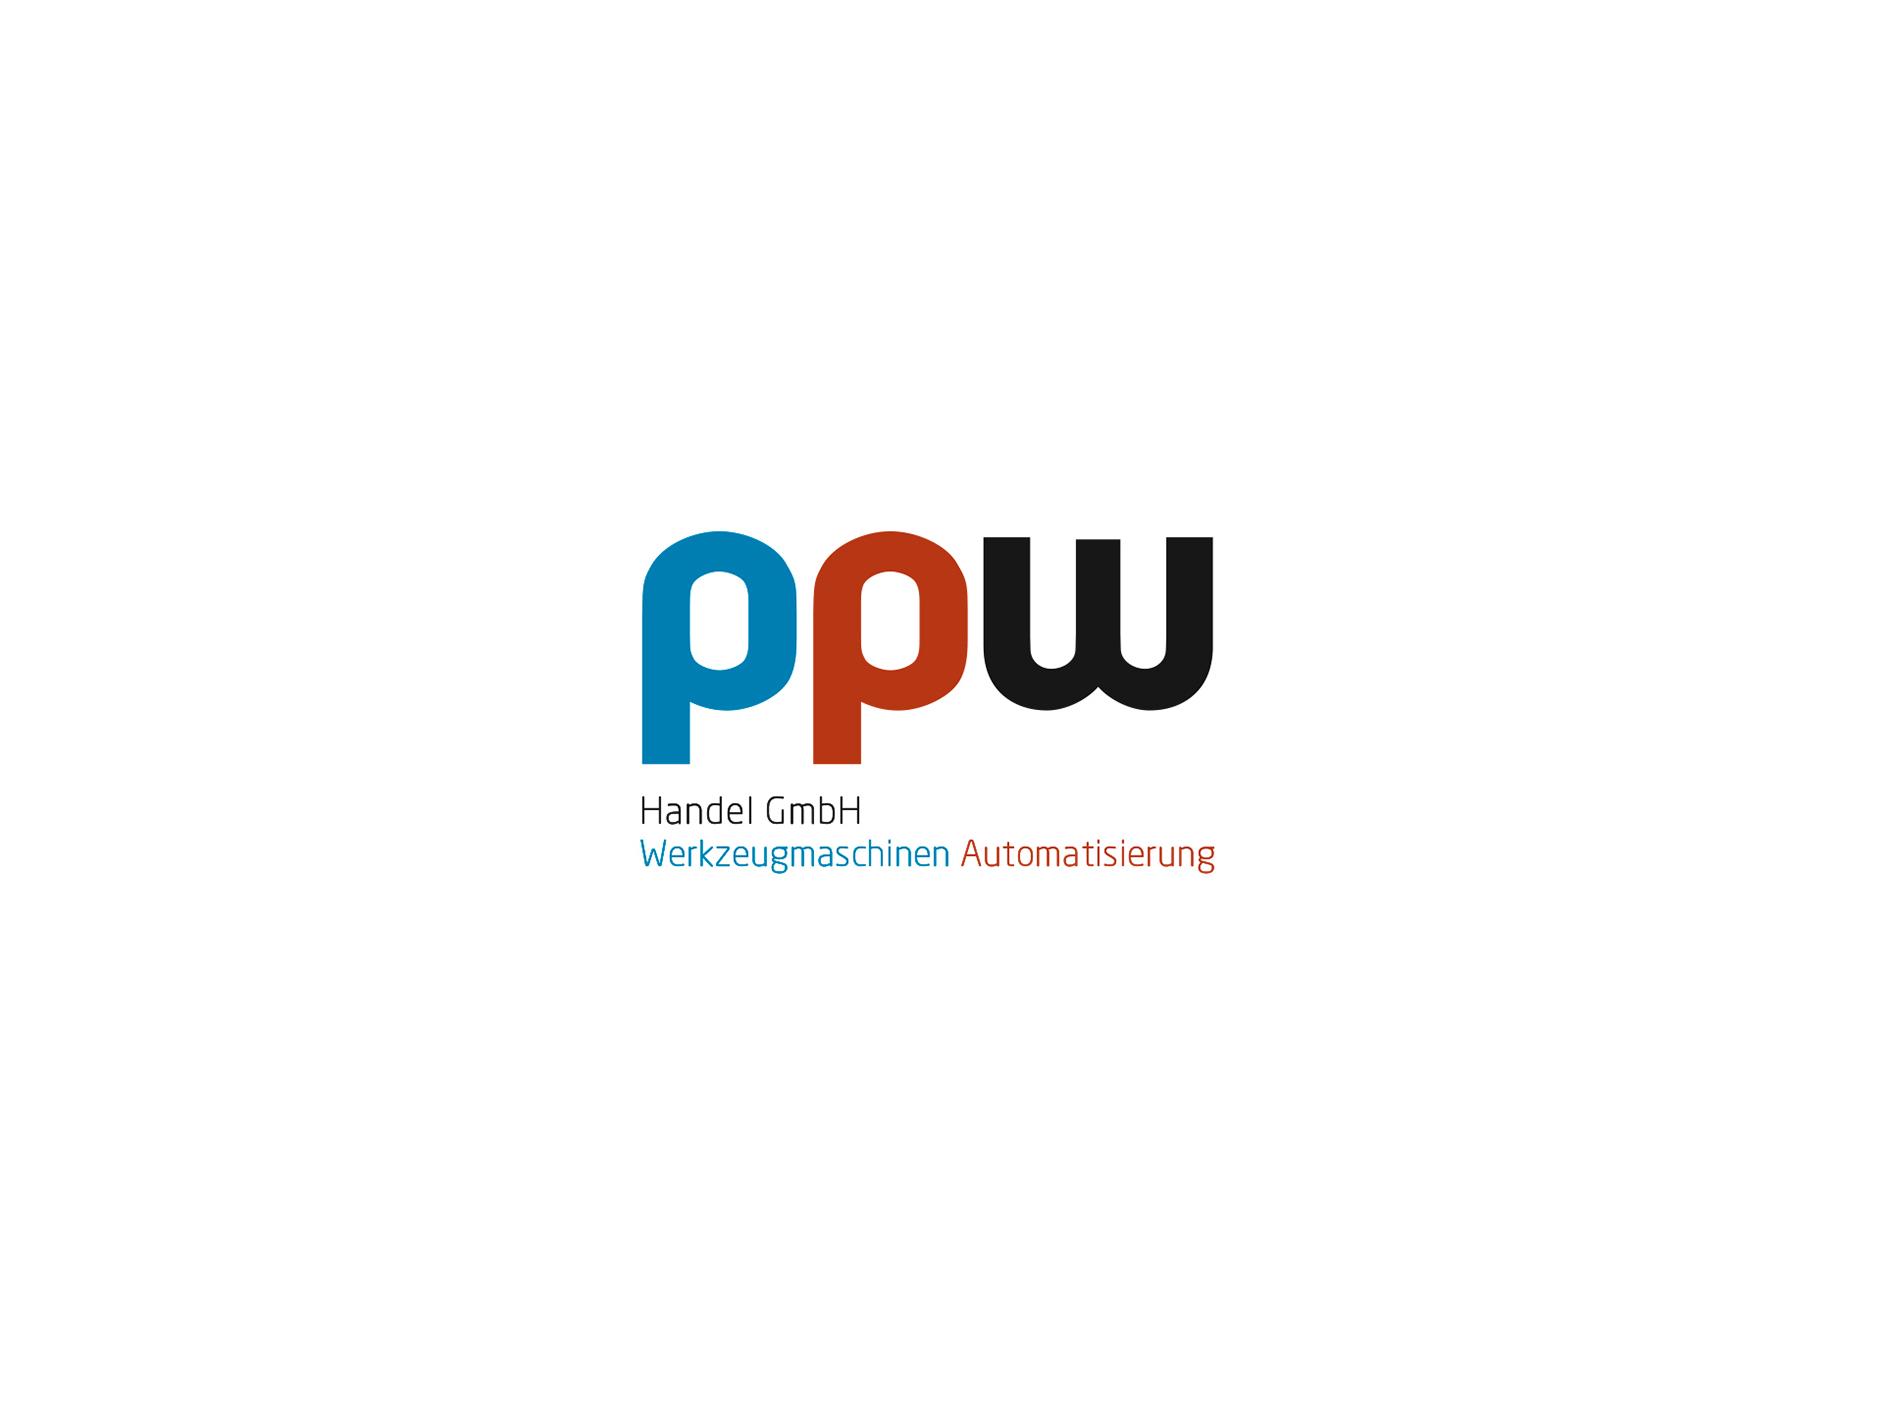 ppw Handel GmbH